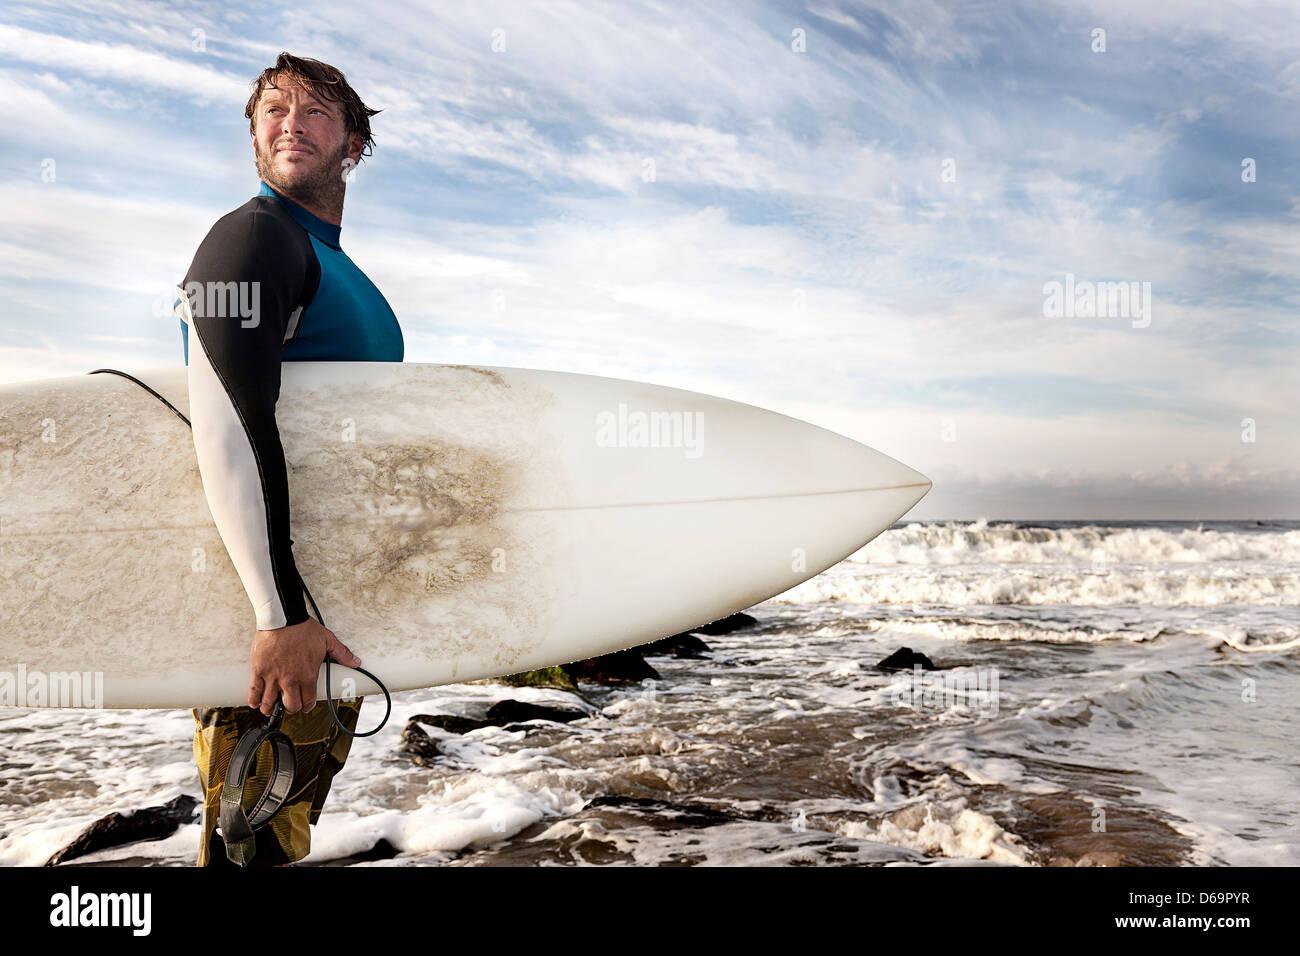 Surfer tragen Board am Strand Stockbild